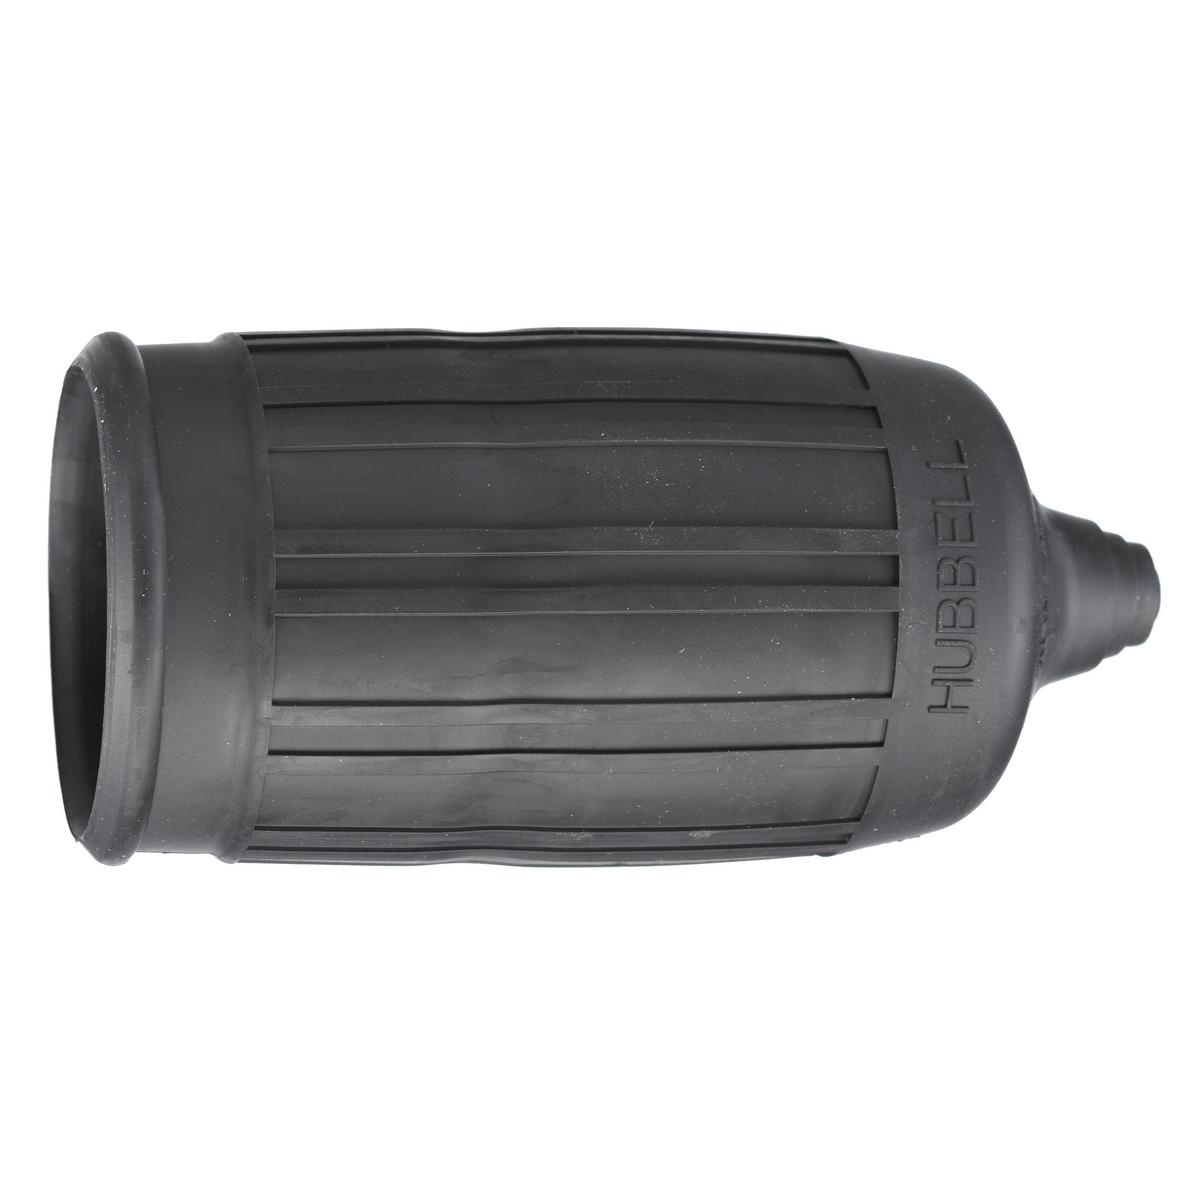 Hubbell HBL6032 Twist-Lock Black Weatherproof Seal-Tite Boot